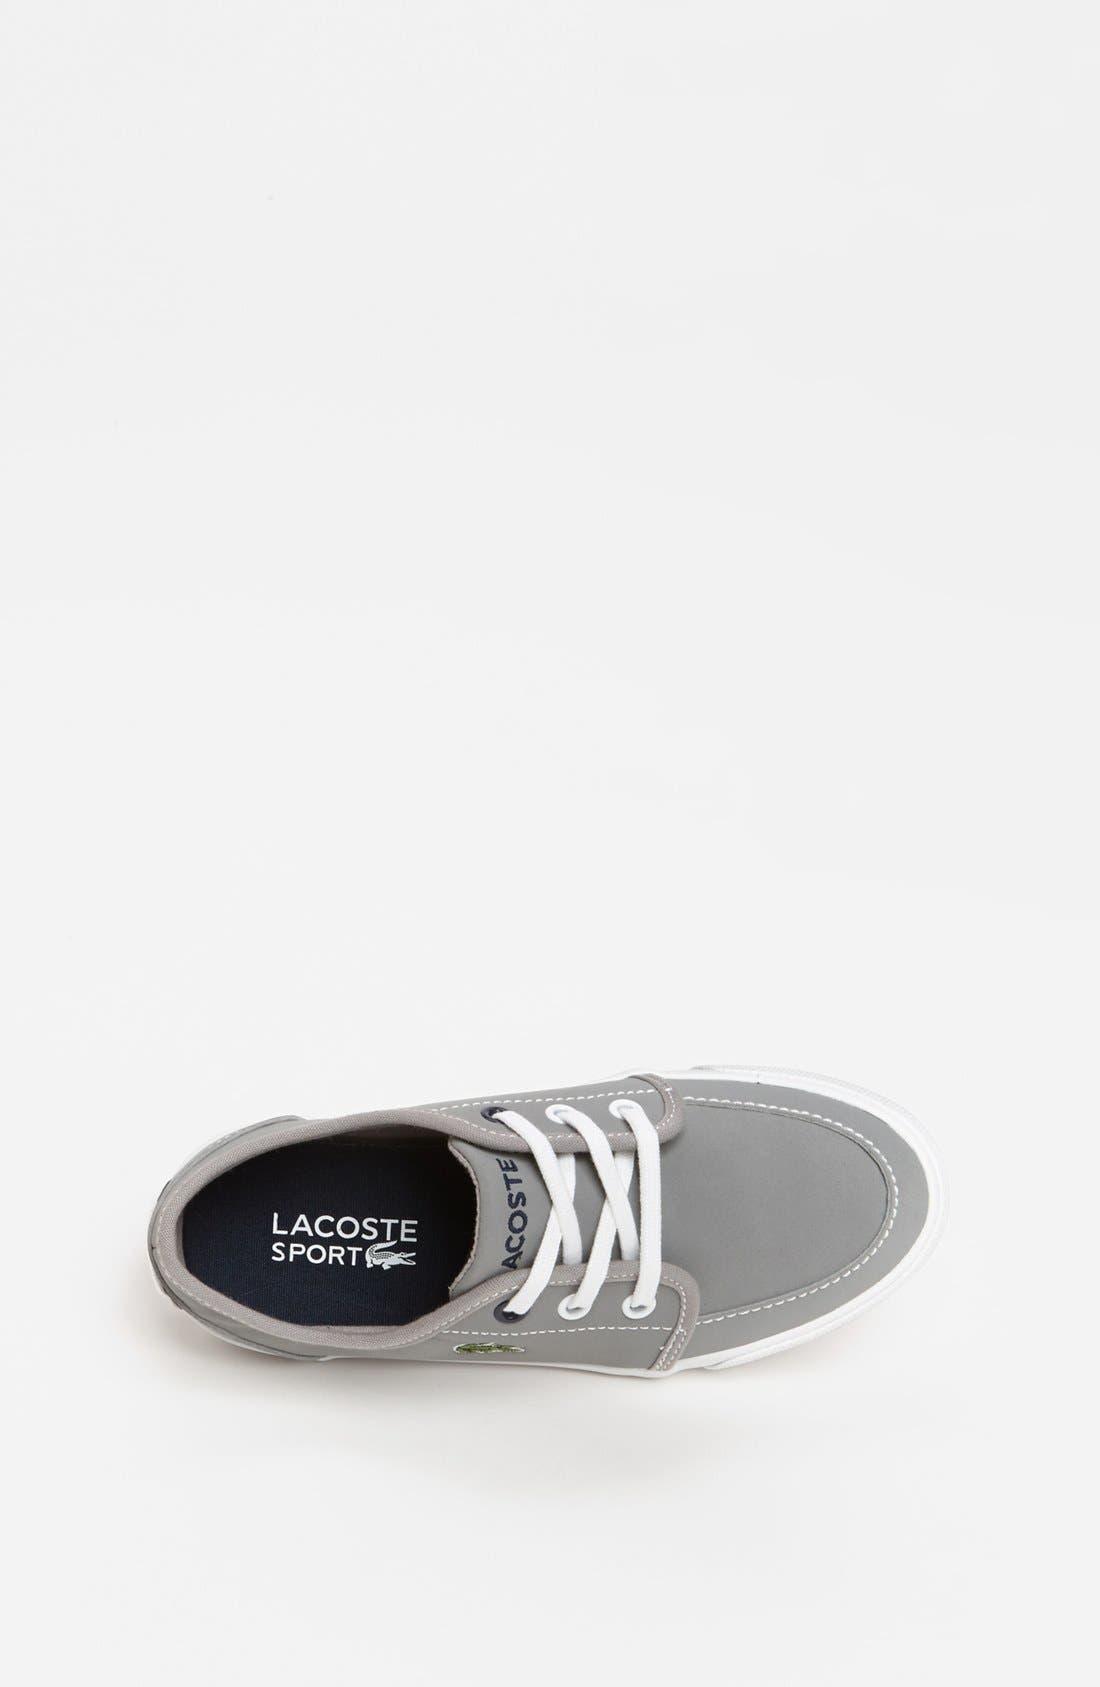 Alternate Image 3  - Lacoste 'Boat DE' Sneaker (Toddler & Little Kid)